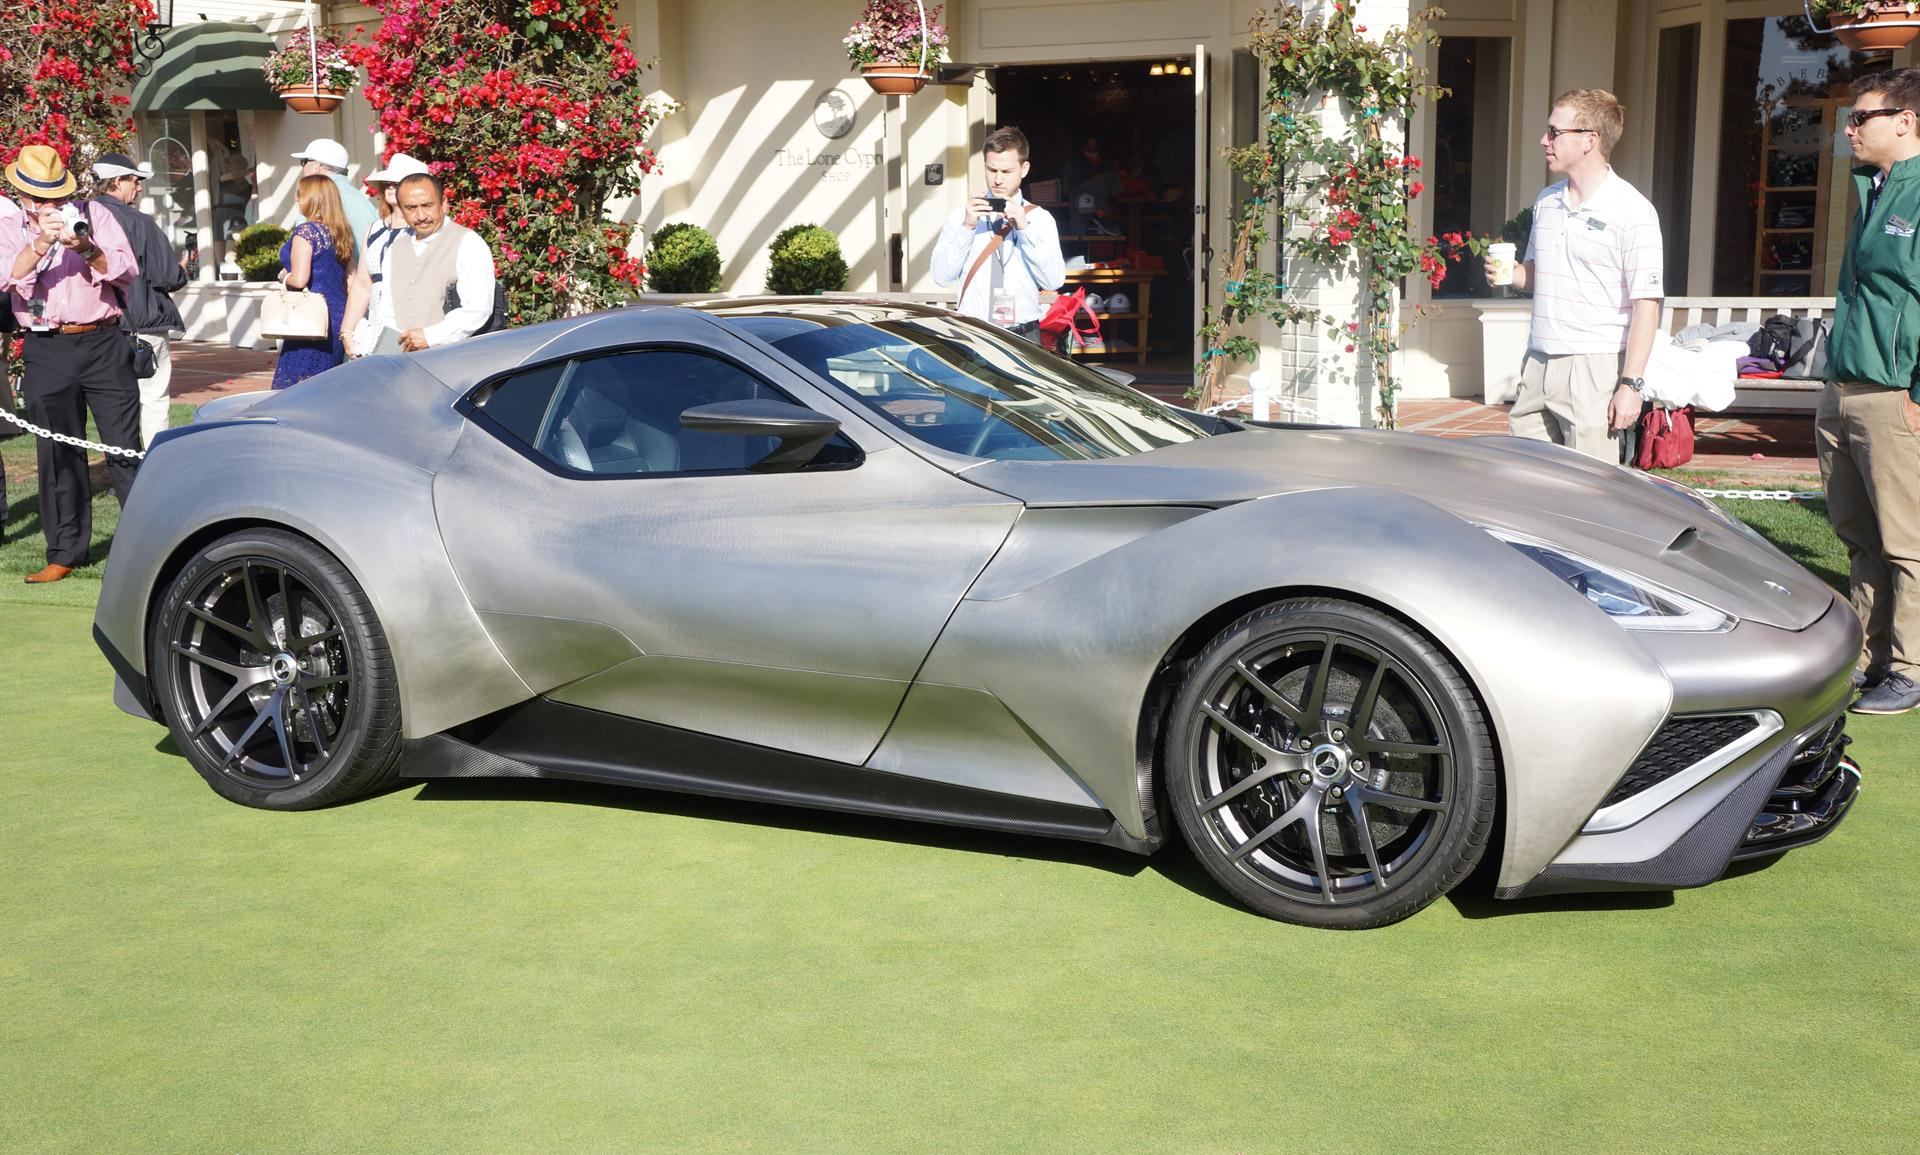 titanium bodied icona vulcano supercar debuts  pebble beach concours video